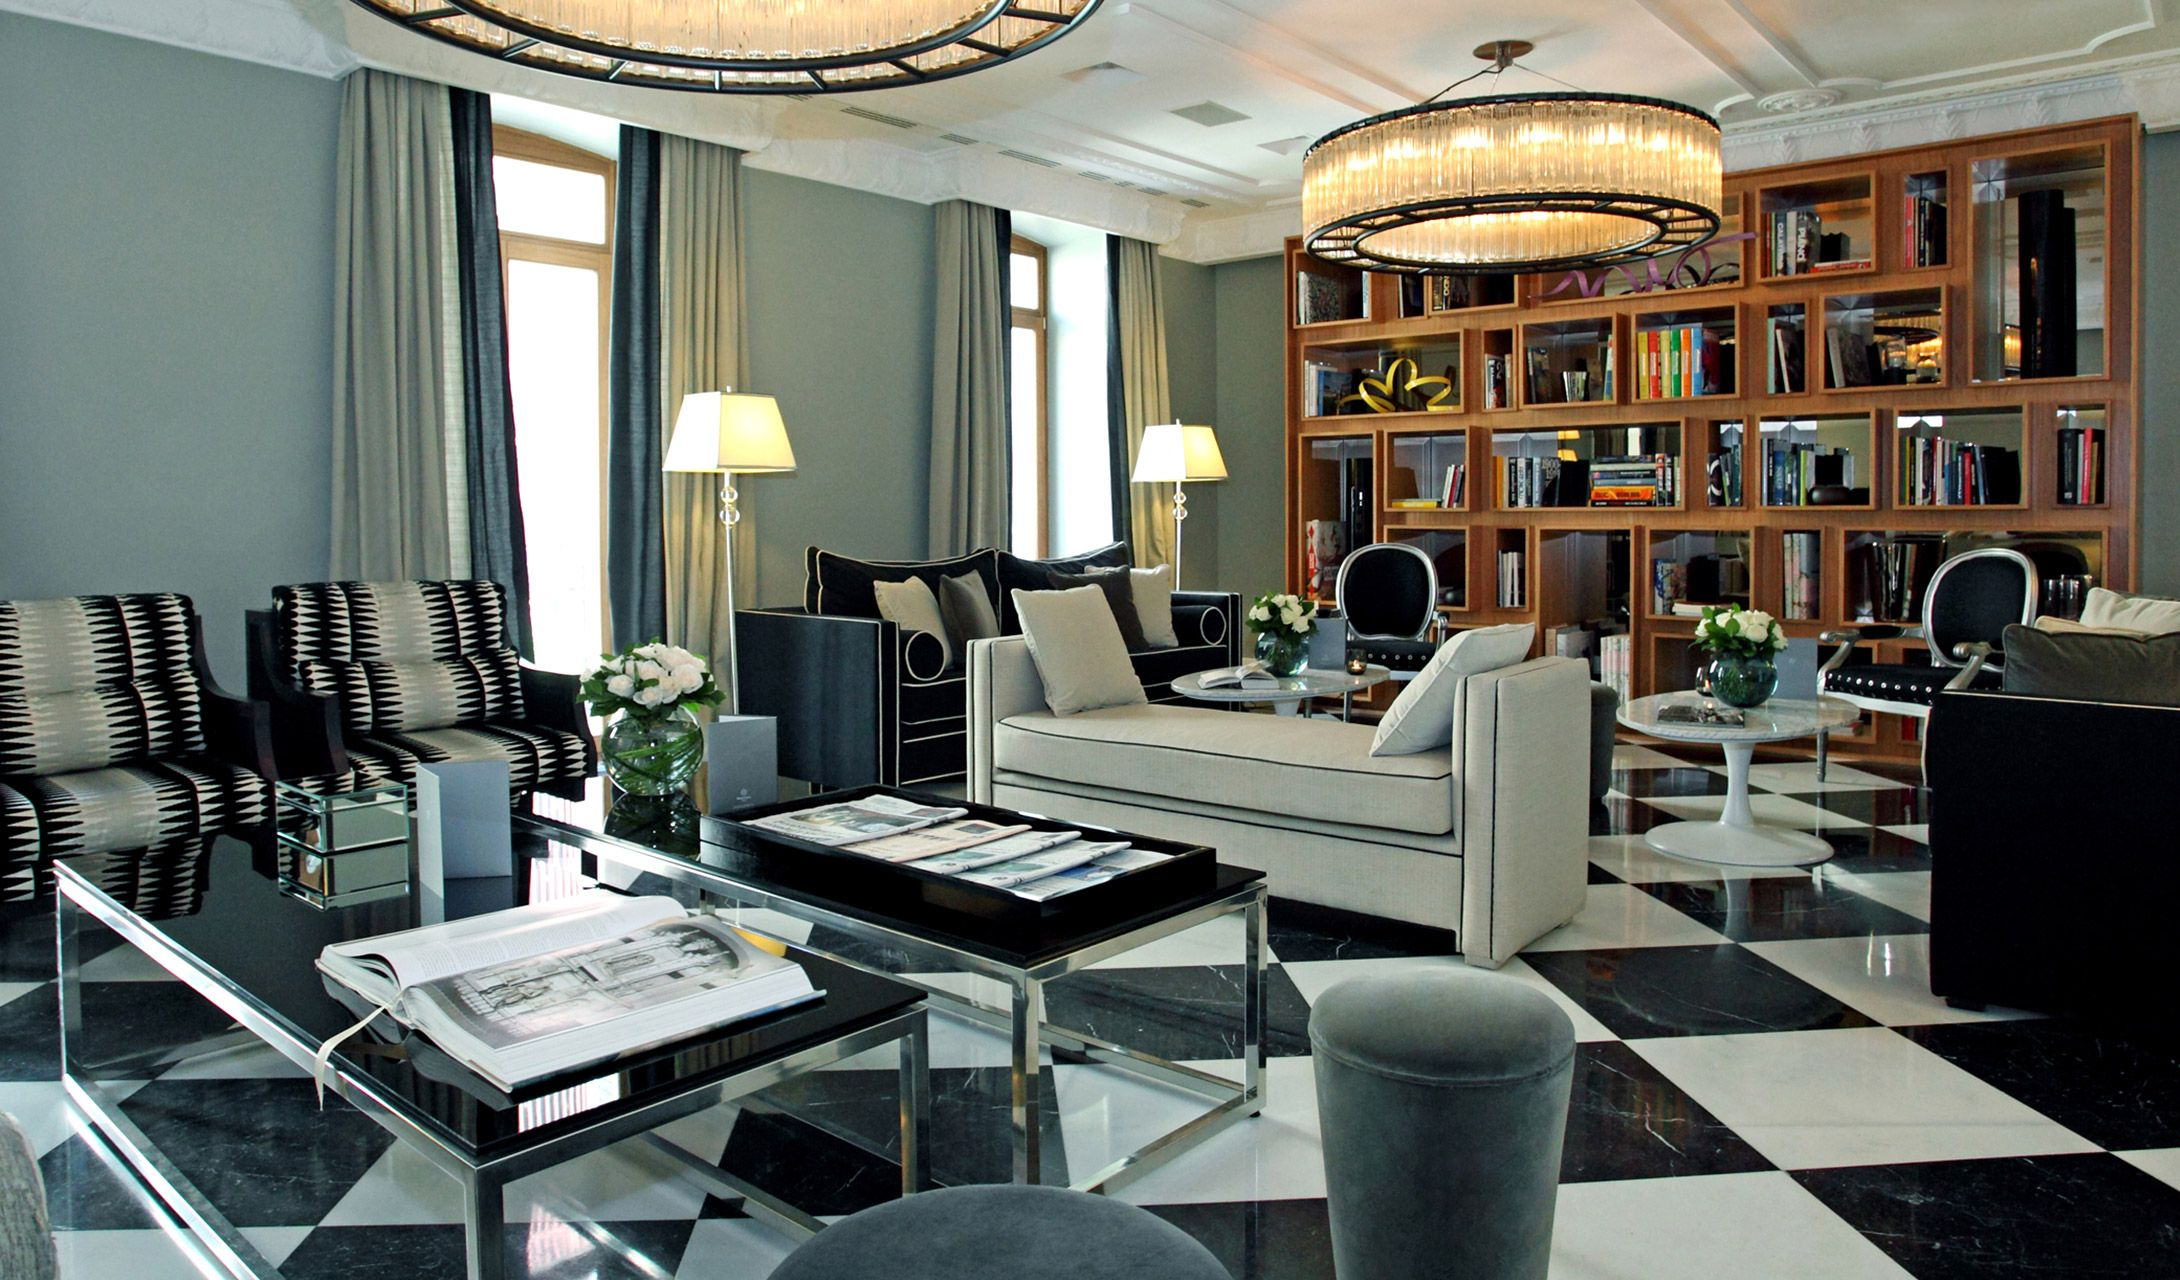 PRINCIPAL MADRID HOTEL - Cerca con Google